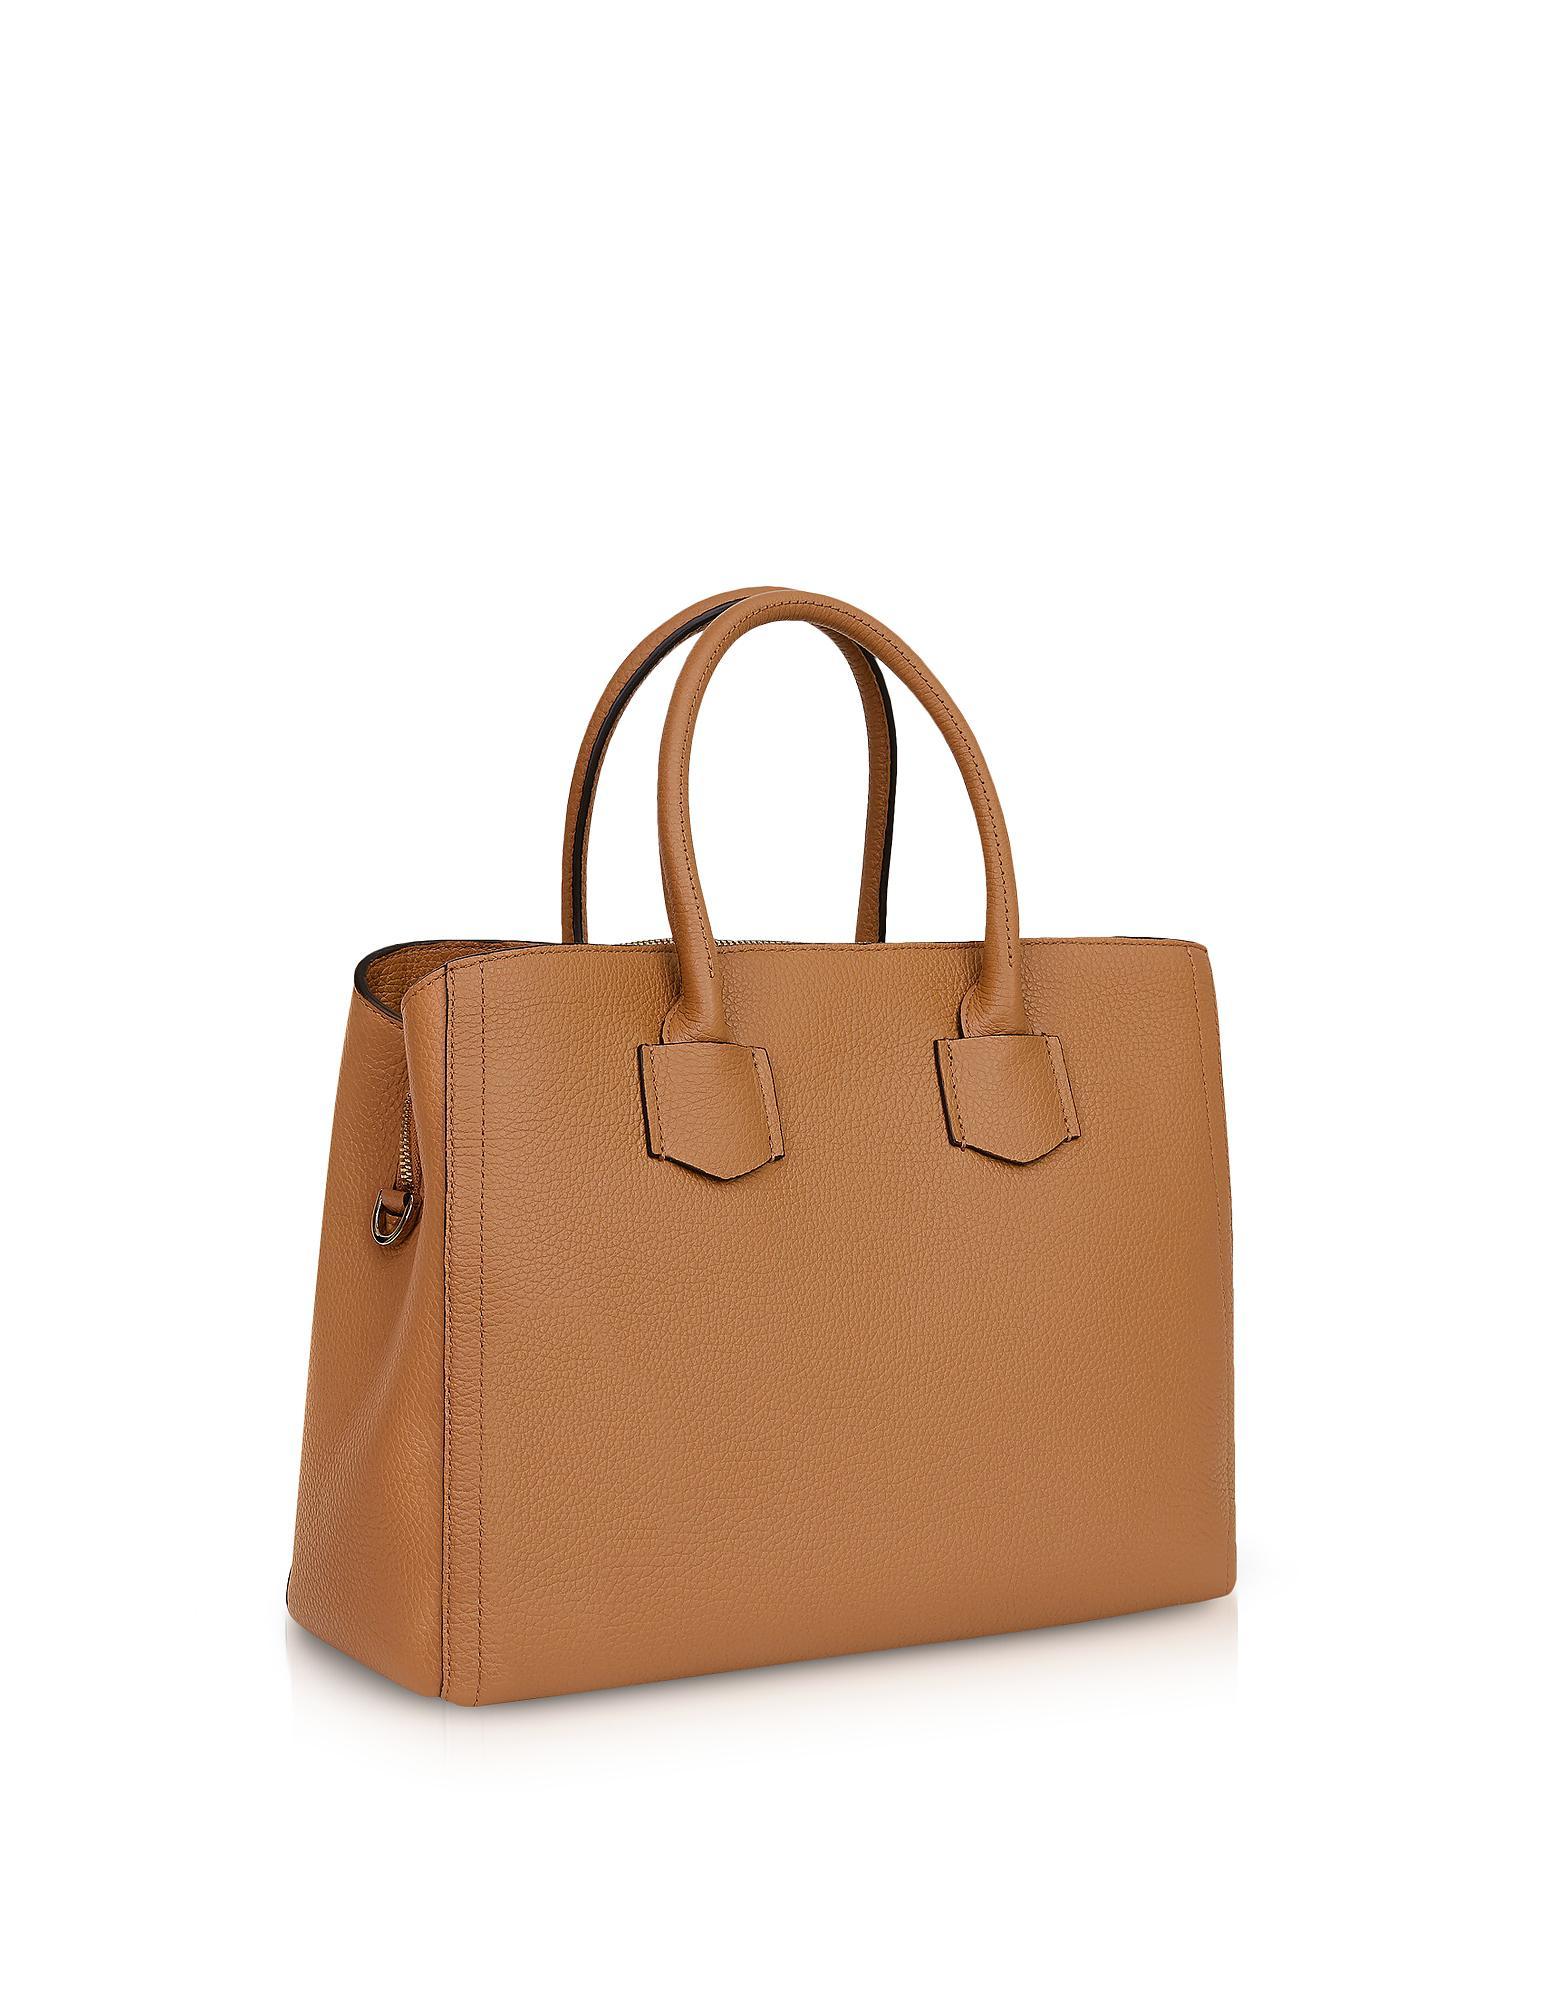 dd941139dcc13 Lyst - Furla Eden Medium Tote Bag in Brown